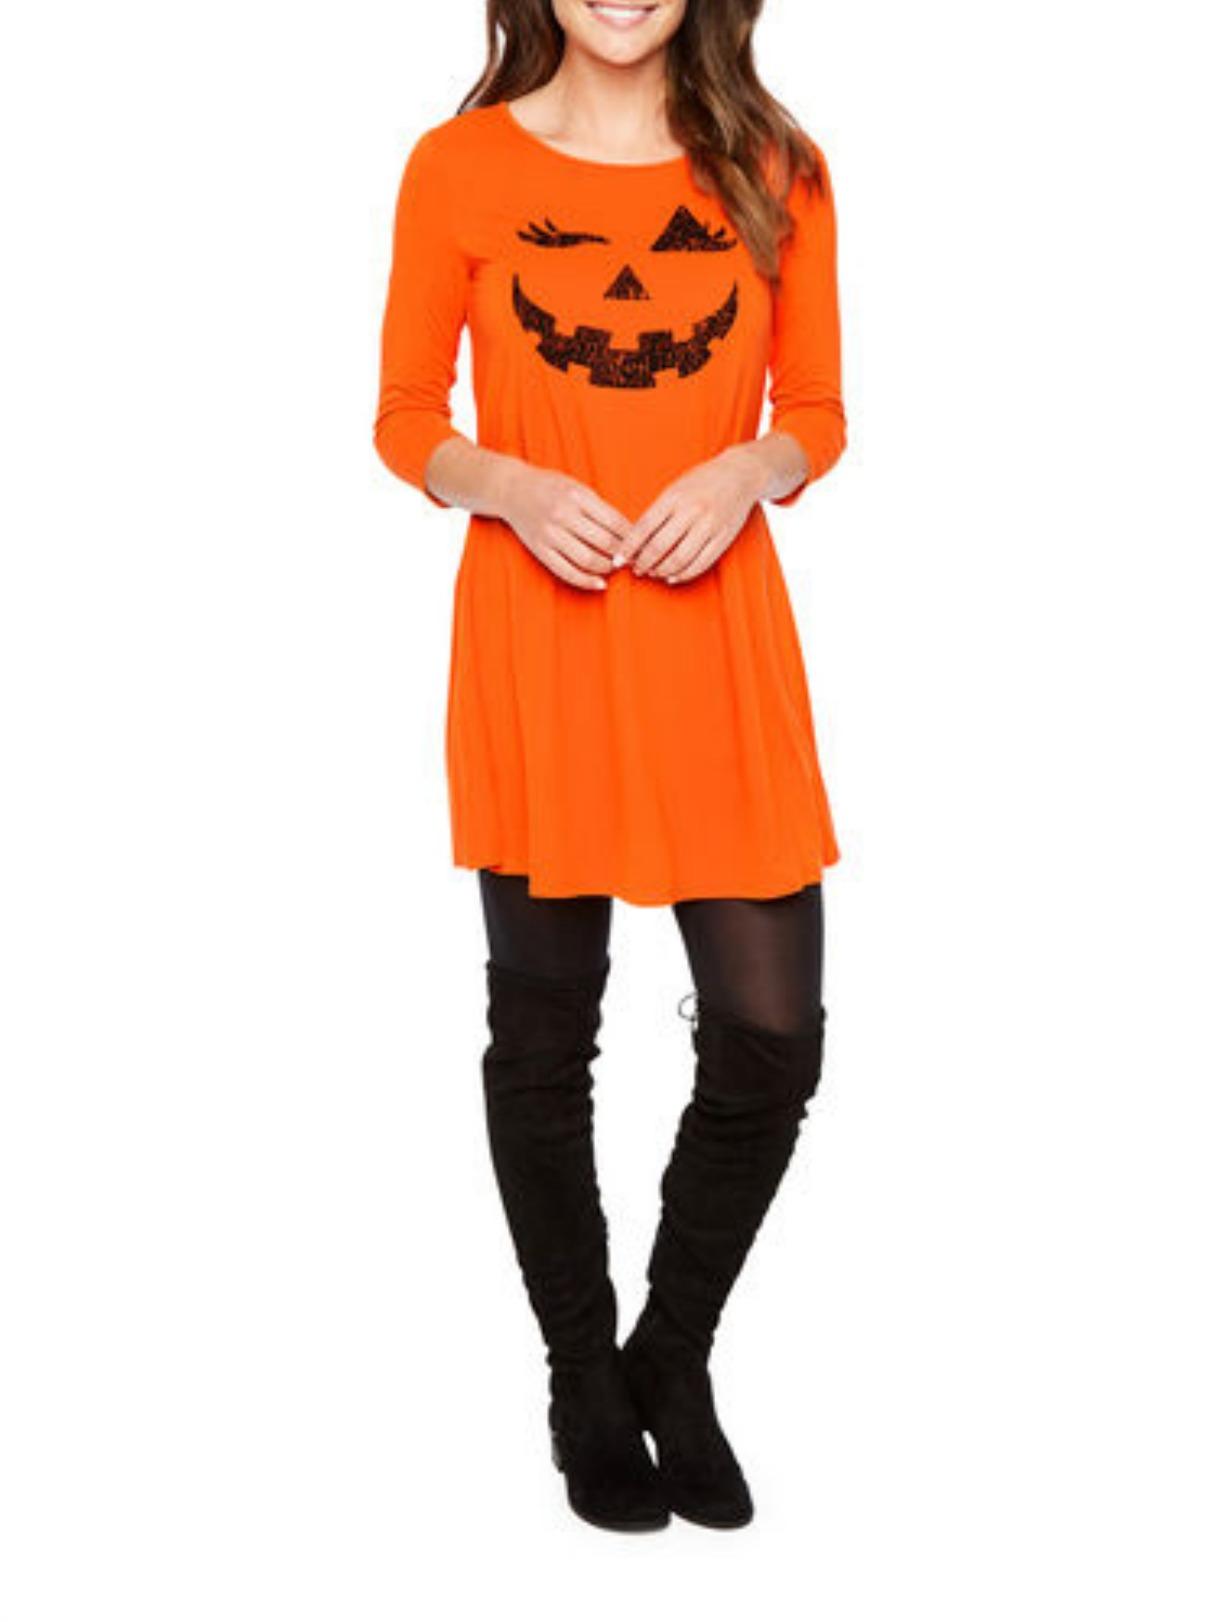 St. John's Bay 3/4 Sleeve Halloween Swing Dress - Orange Pumpkin